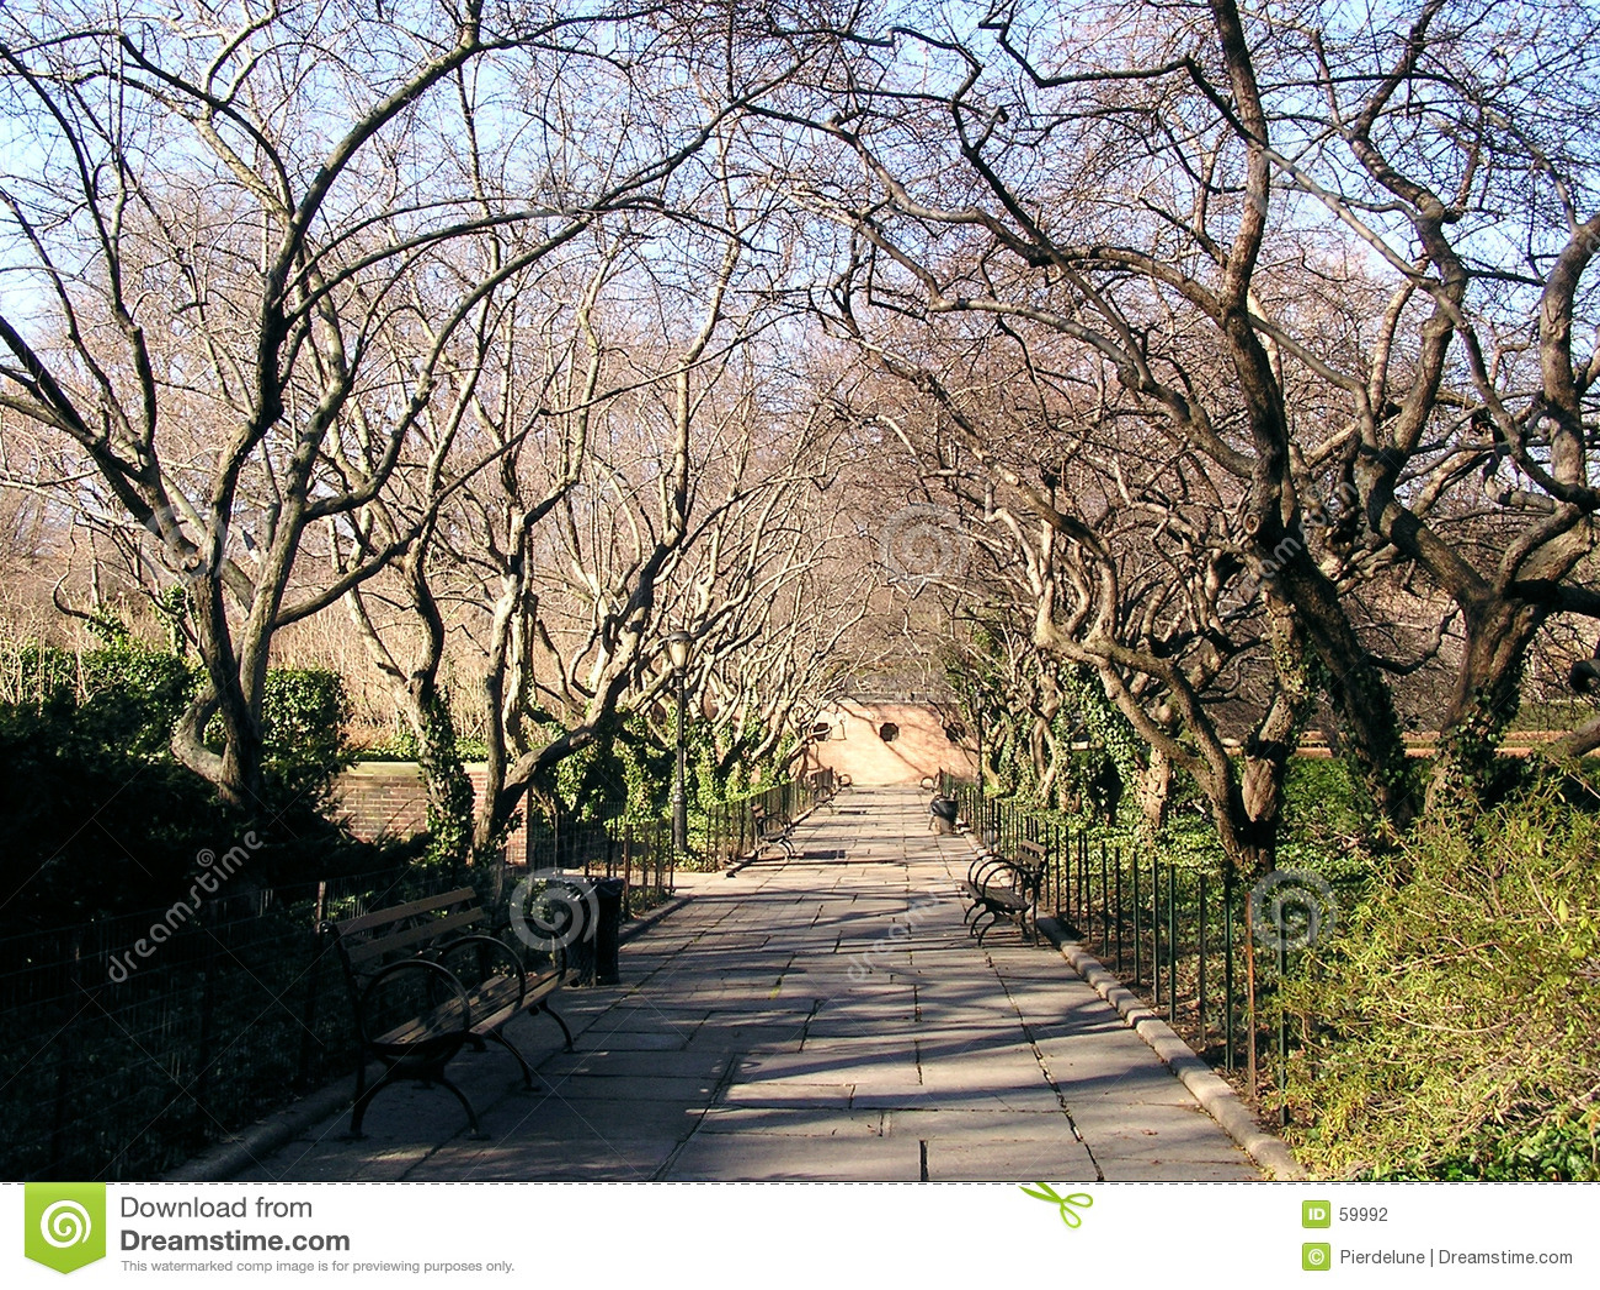 2 central park scenery